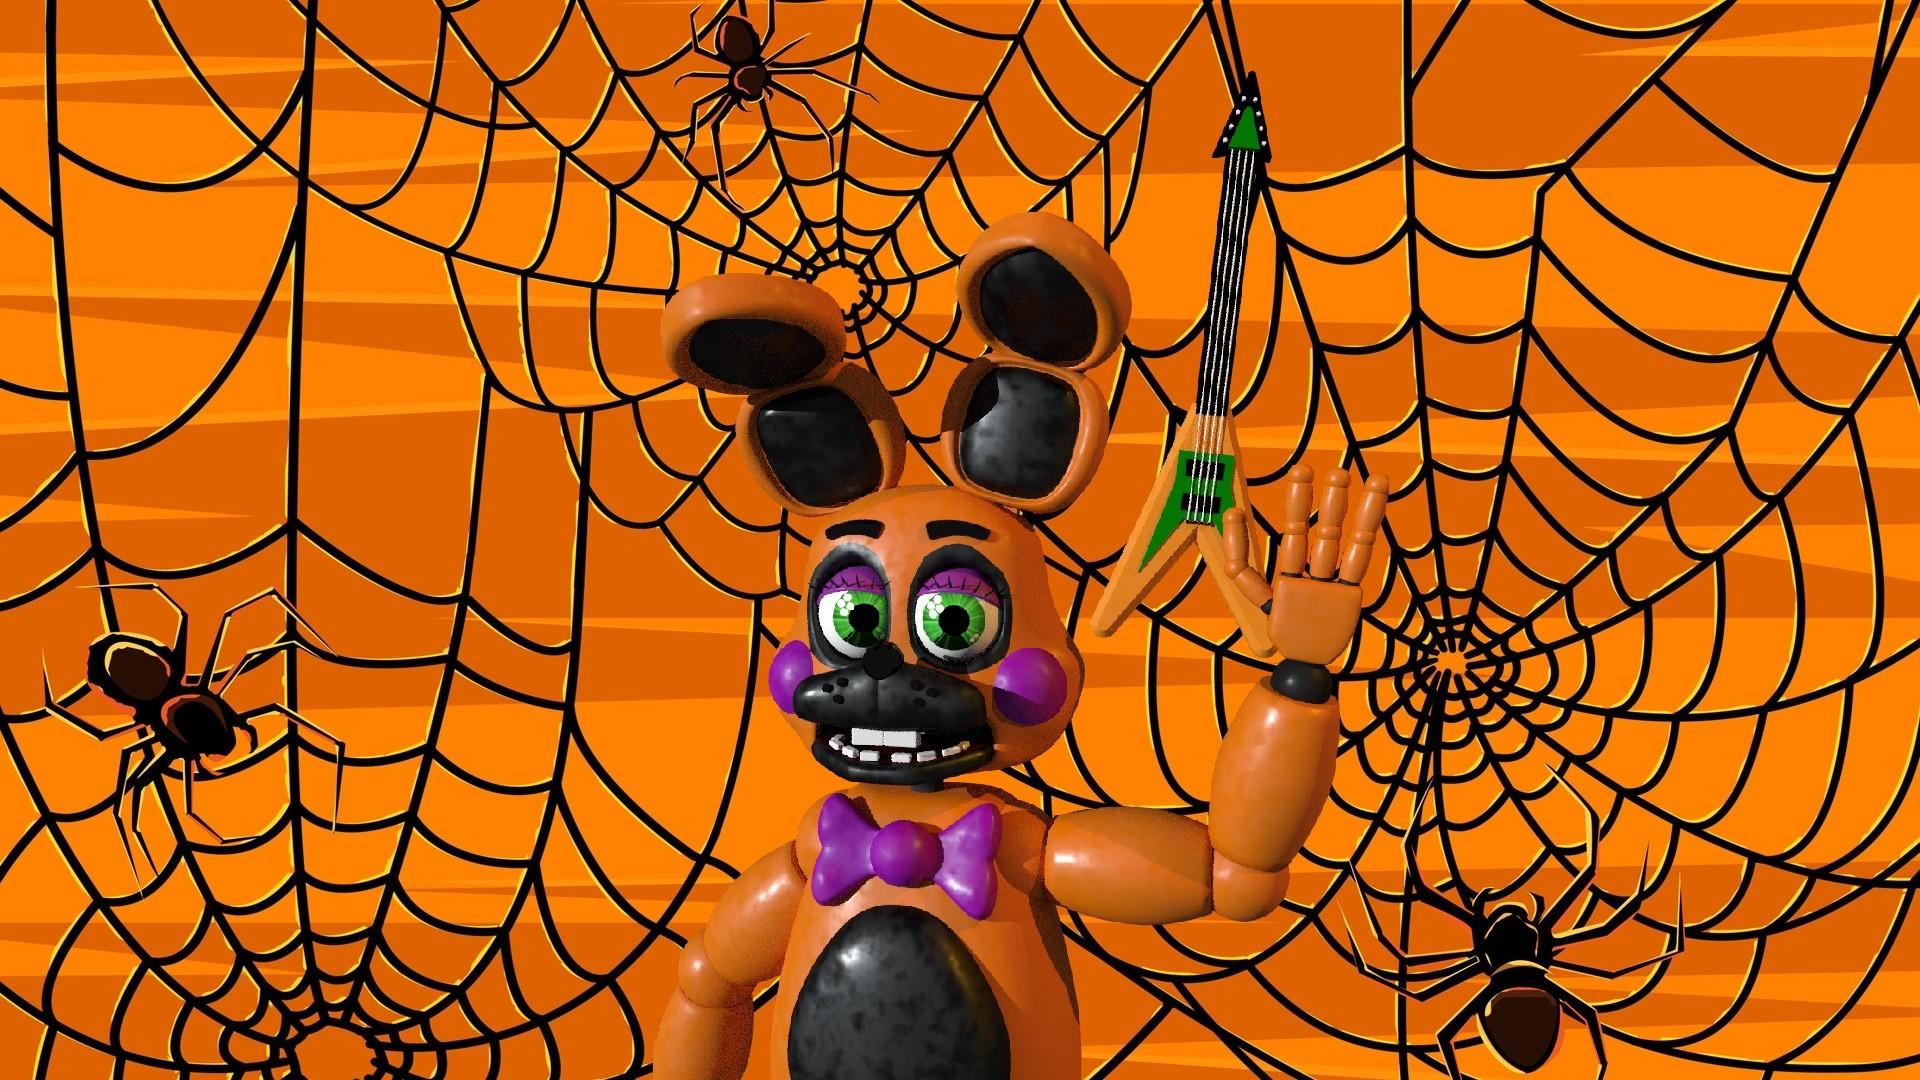 fnaf halloween wallpaper ;  6816174_wonderful_halloween_wallpaper_by_fnaf2master-d9ajda8